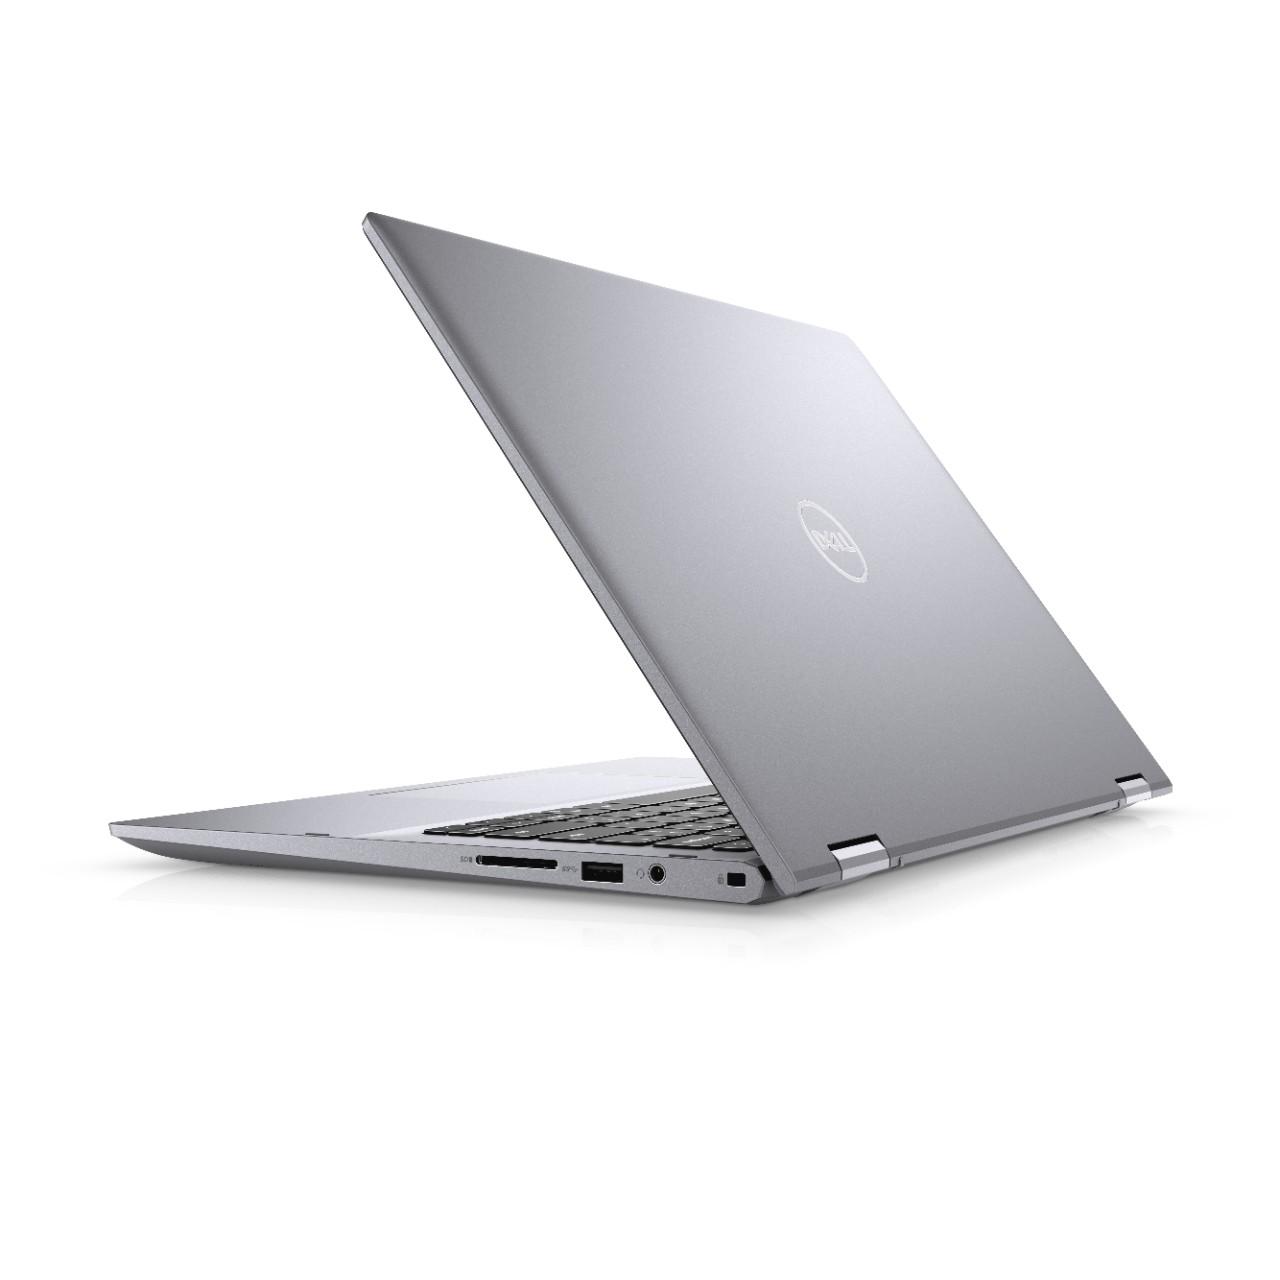 Dell Inspiron 5406 14'' FHD 2v1 Touch i7-1165G7/8GB/512GB/MX330/FPR/HDMI/USB-C/W10Pro/3RNBD/Stříbrný - 5406-24862